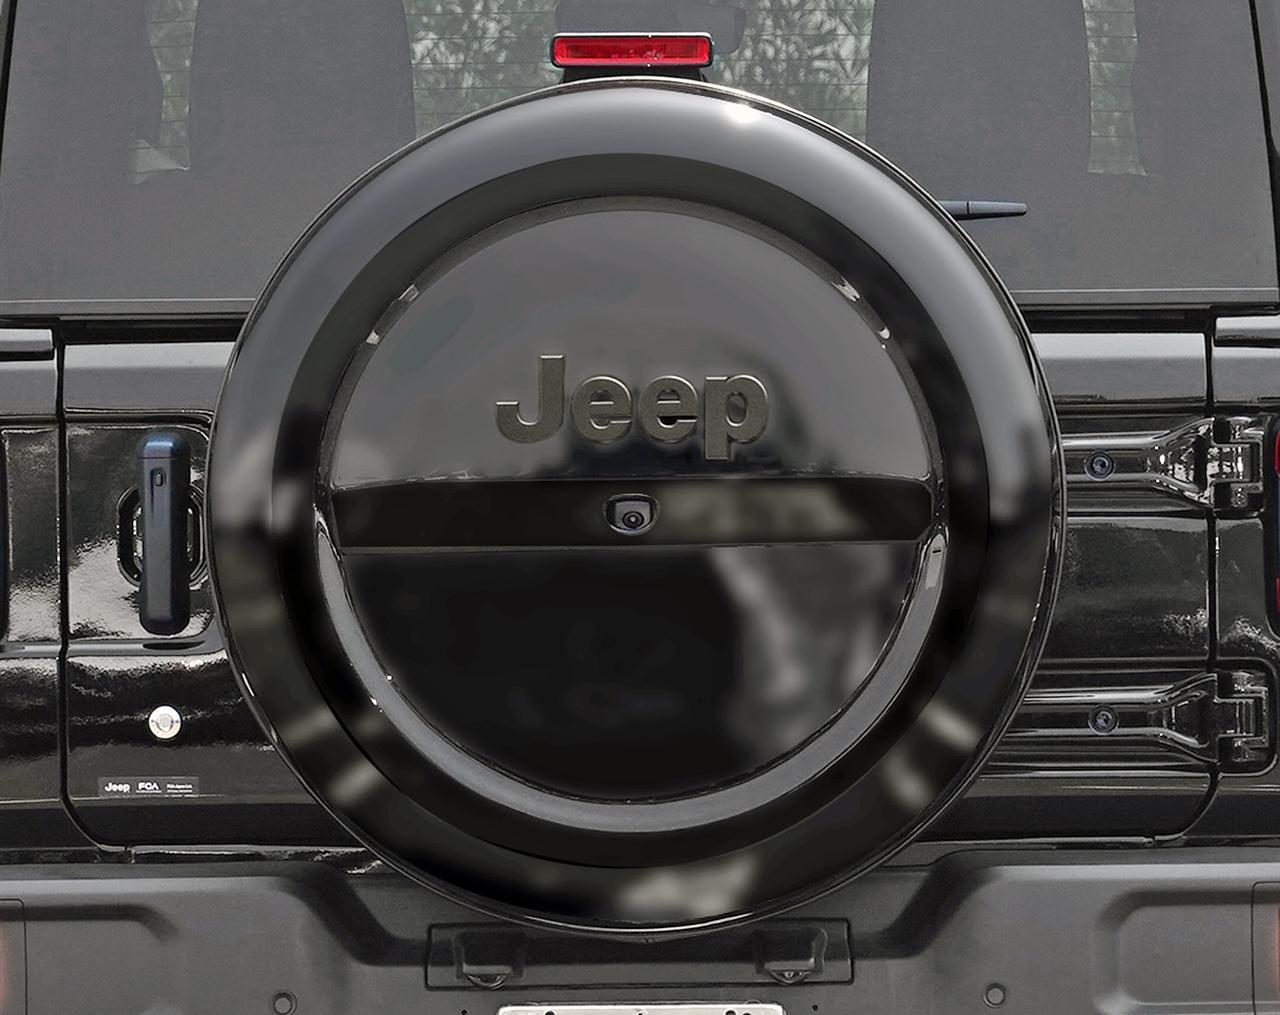 Images : 4番目の画像 - ジープ ラングラーの限定車 - Webモーターマガジン